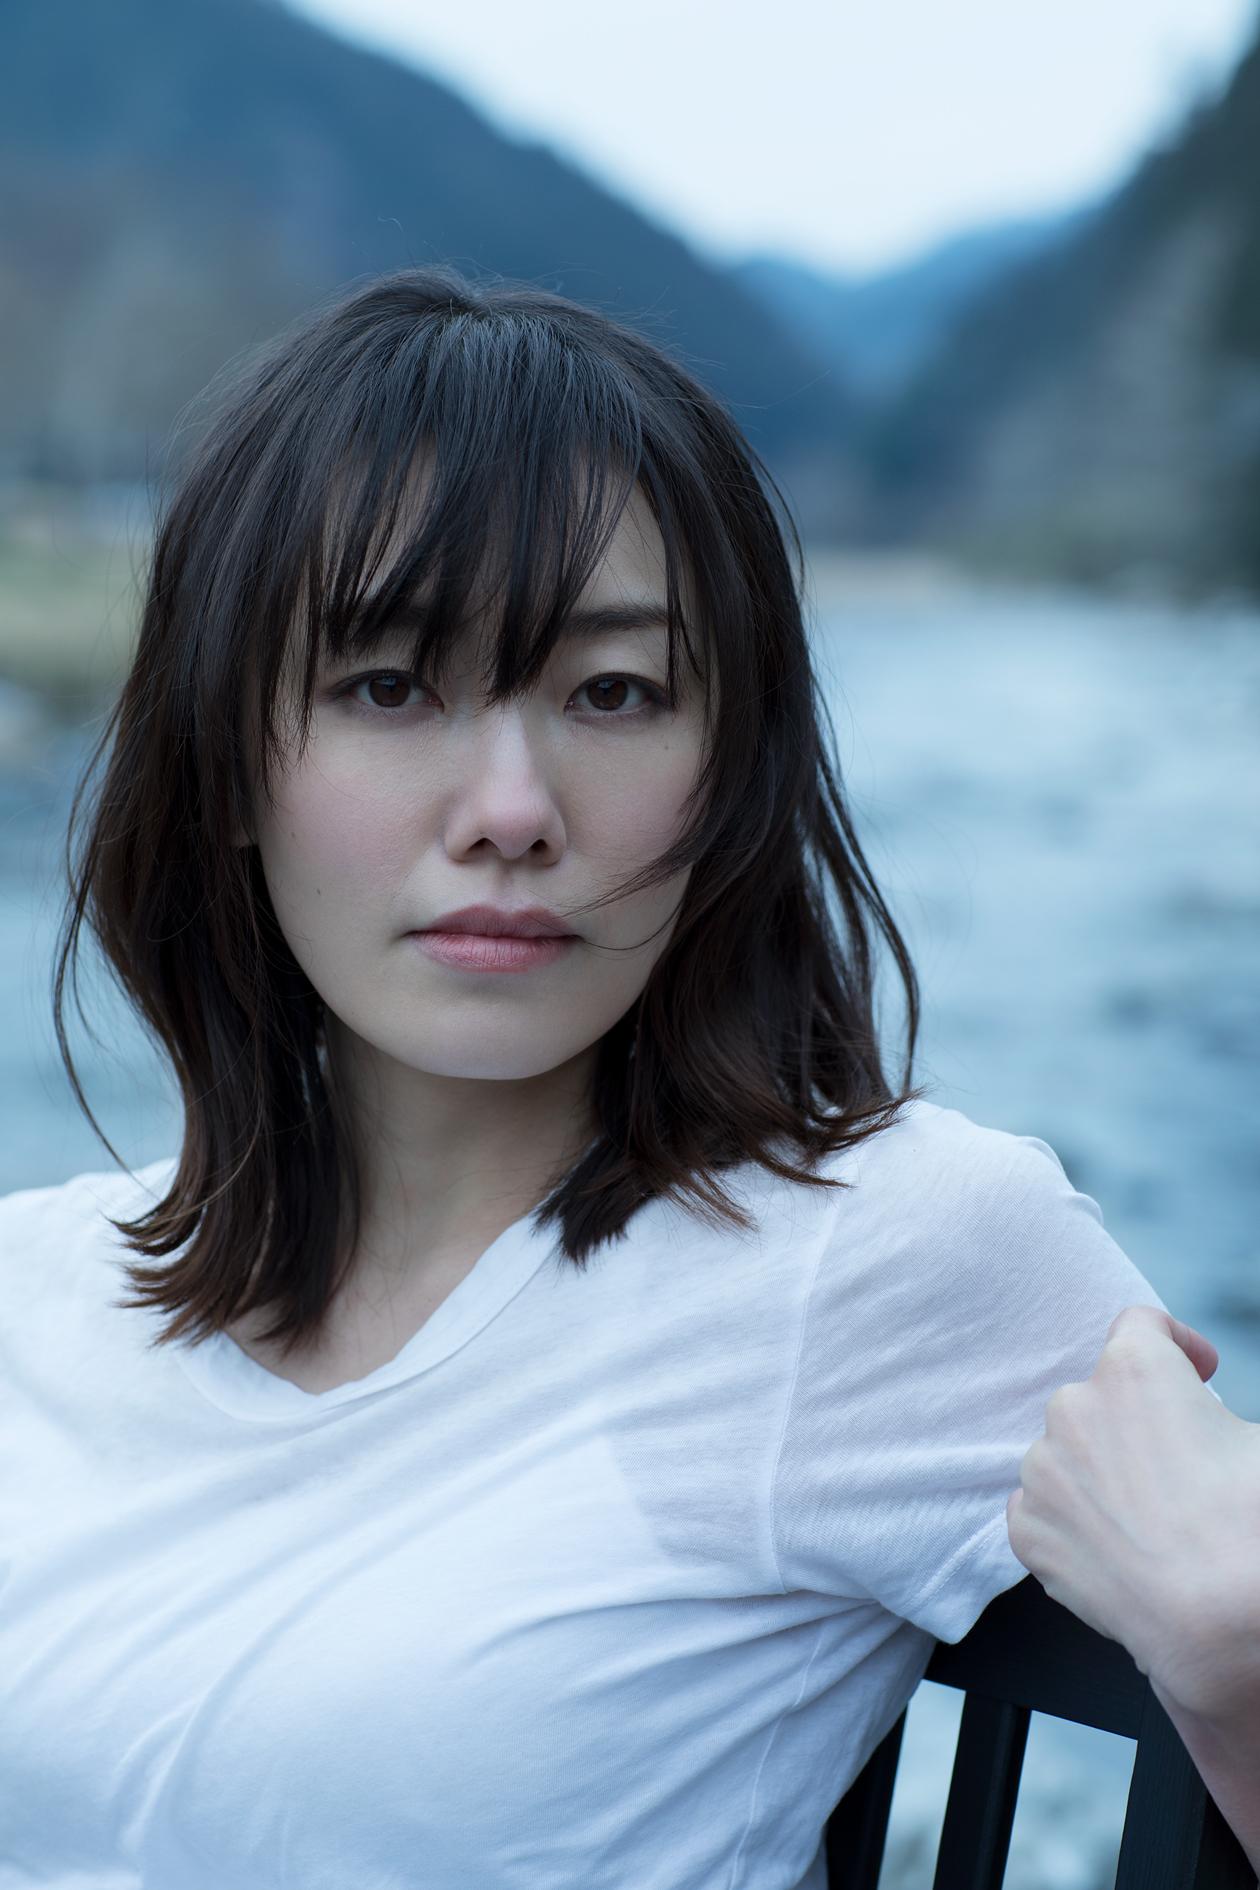 橋本真実「壊す女」Scene2 | Negative Pop